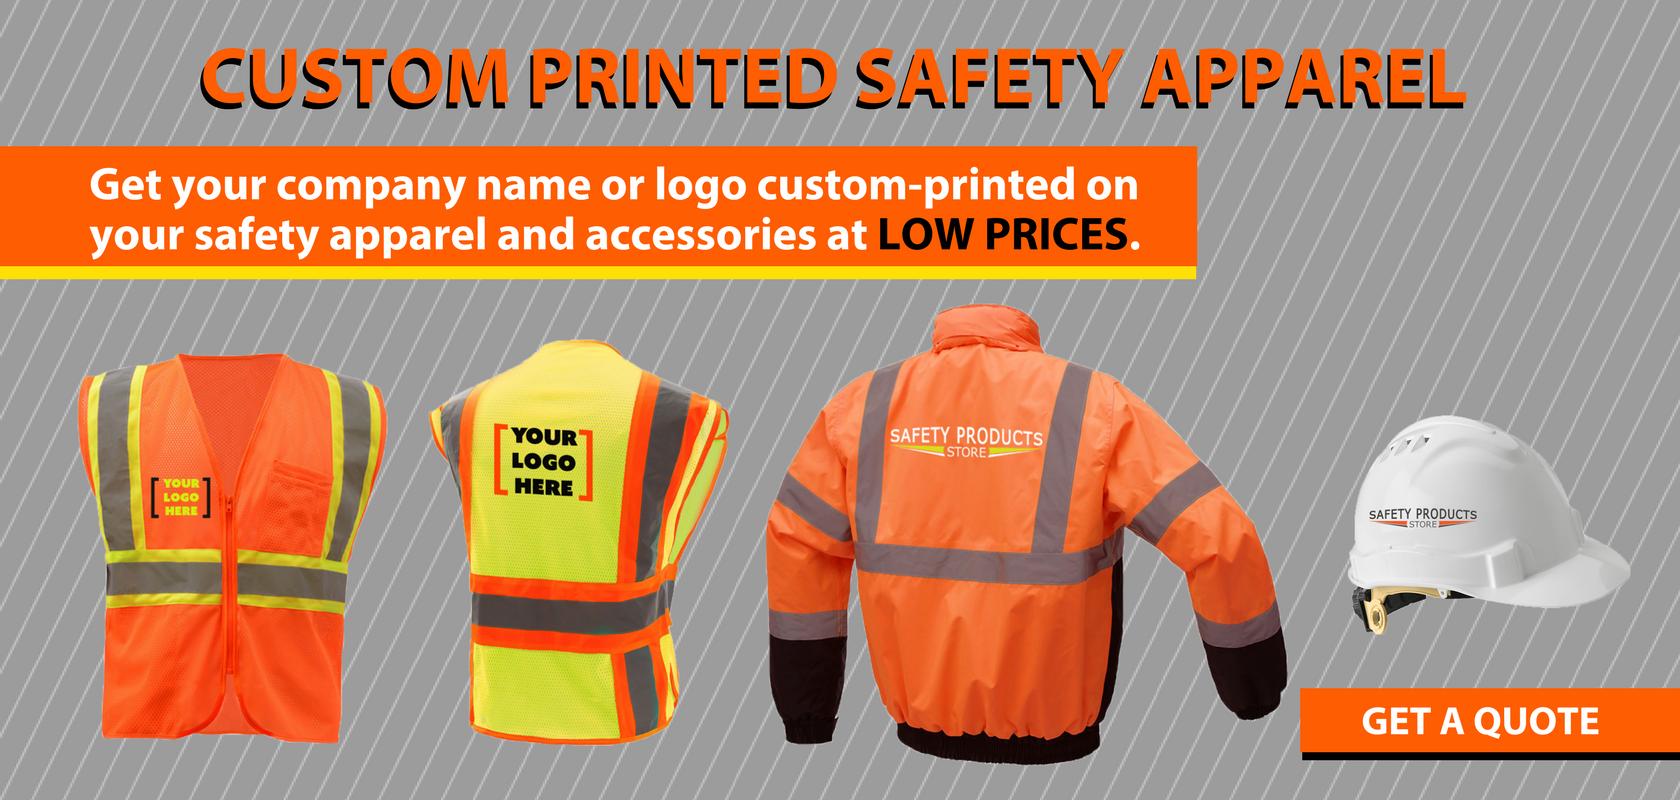 Get Custom Printed Safety Apparel